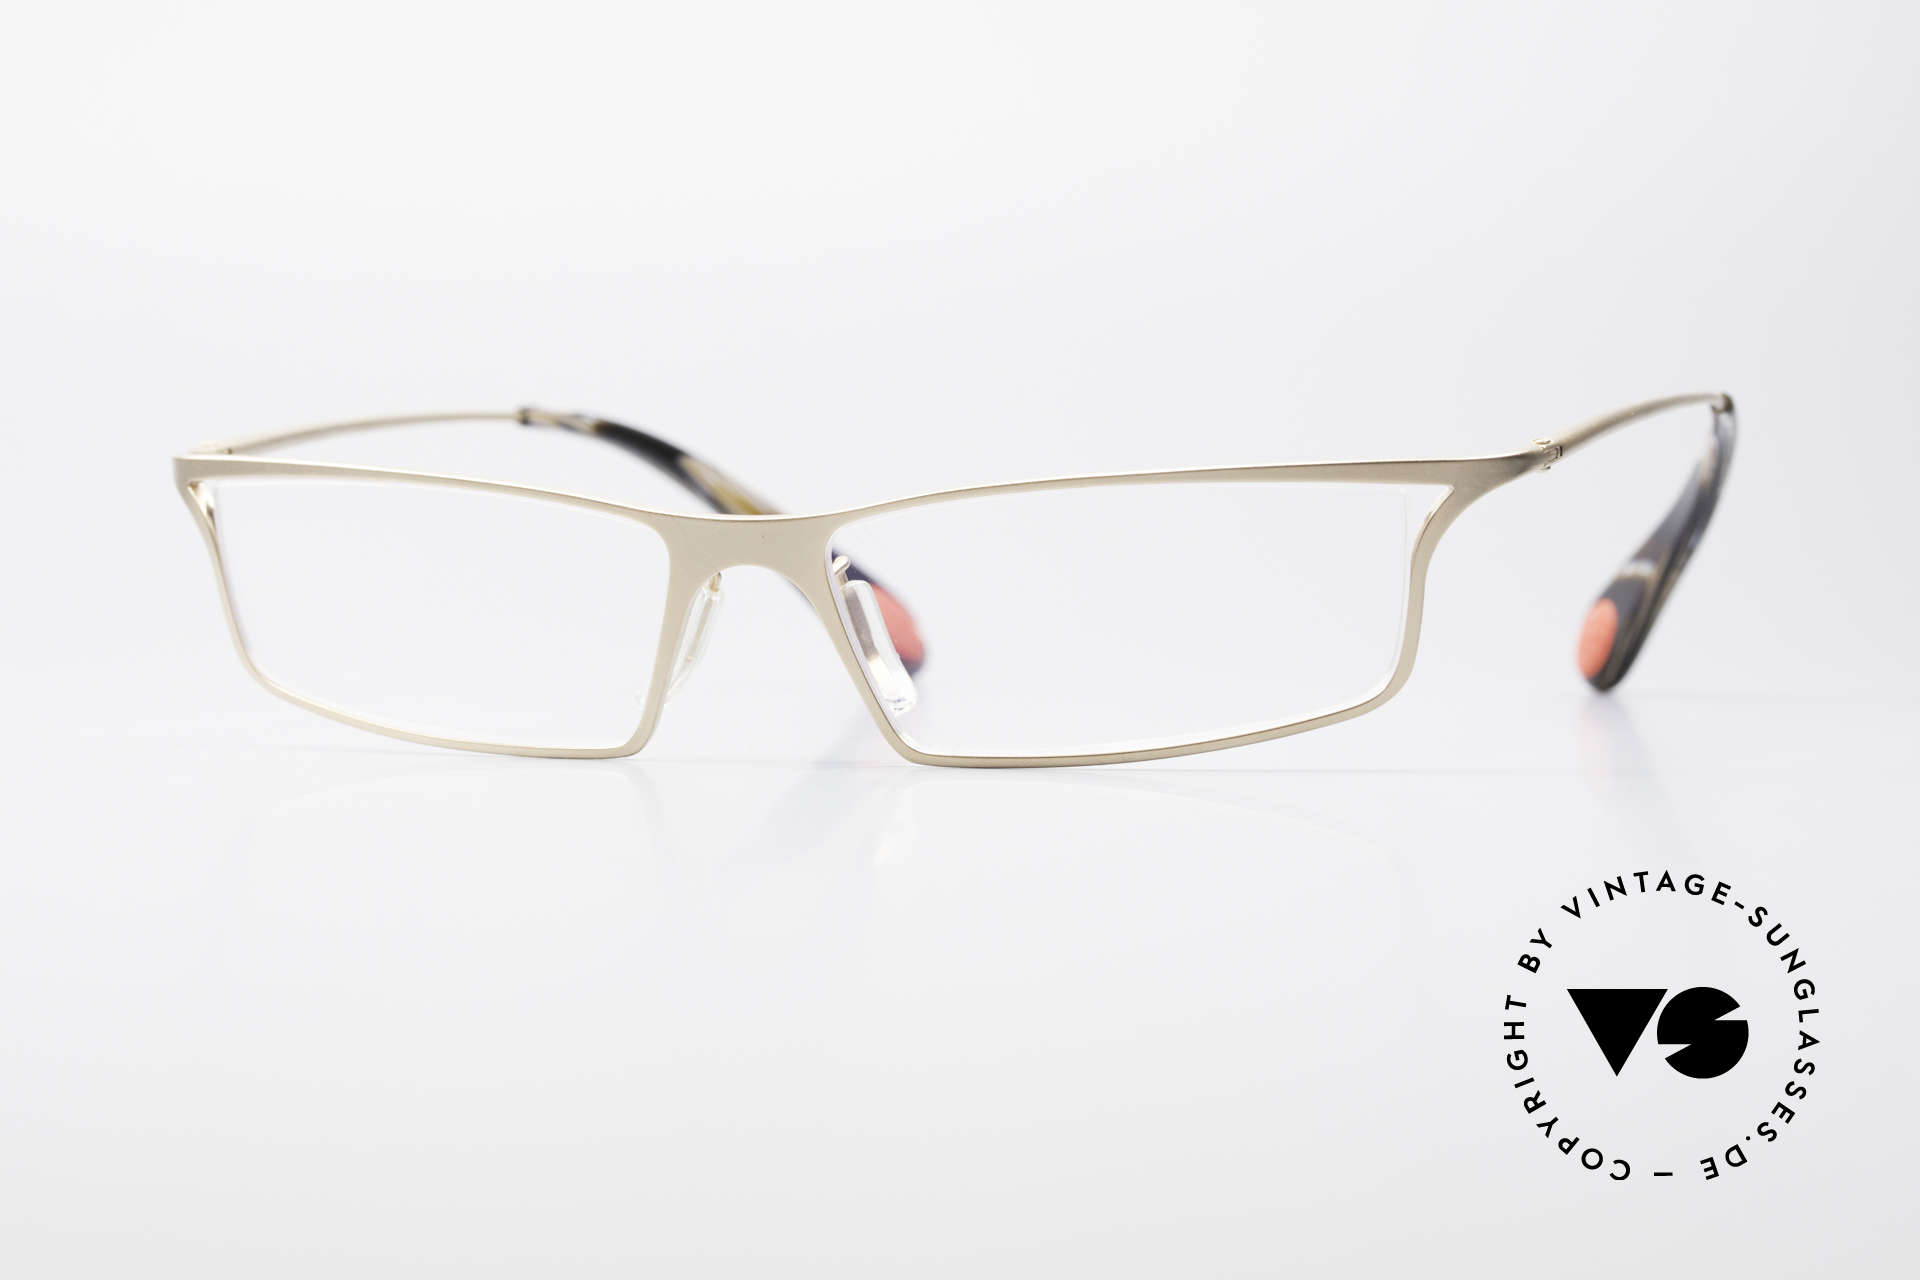 Bugatti 352 Odotype Striking Men's Designer Frame, original BUGATTI high-tech eyeglass-frame, Made for Men